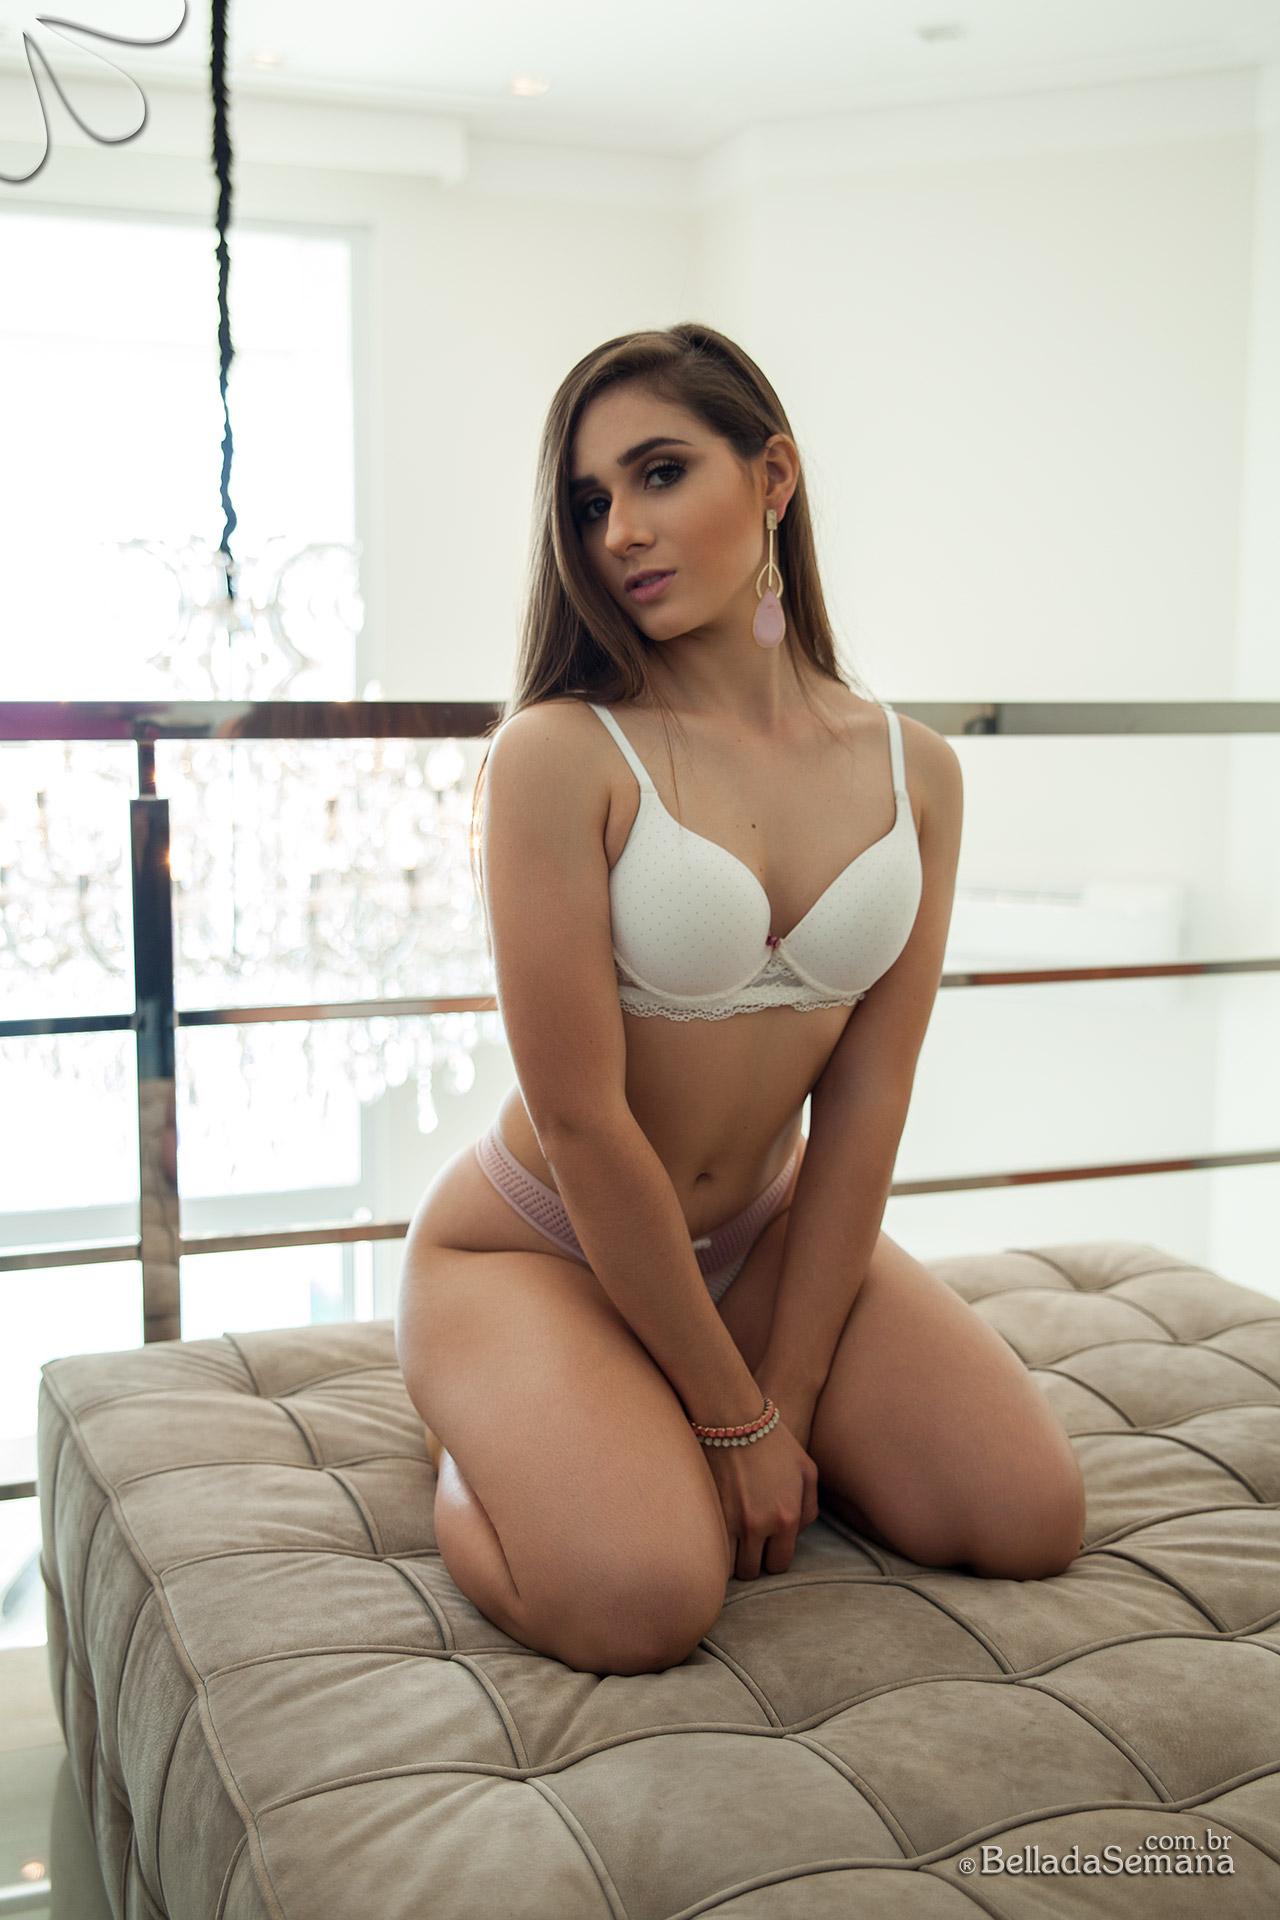 Novo ensaio sensual de Julia Picoloto